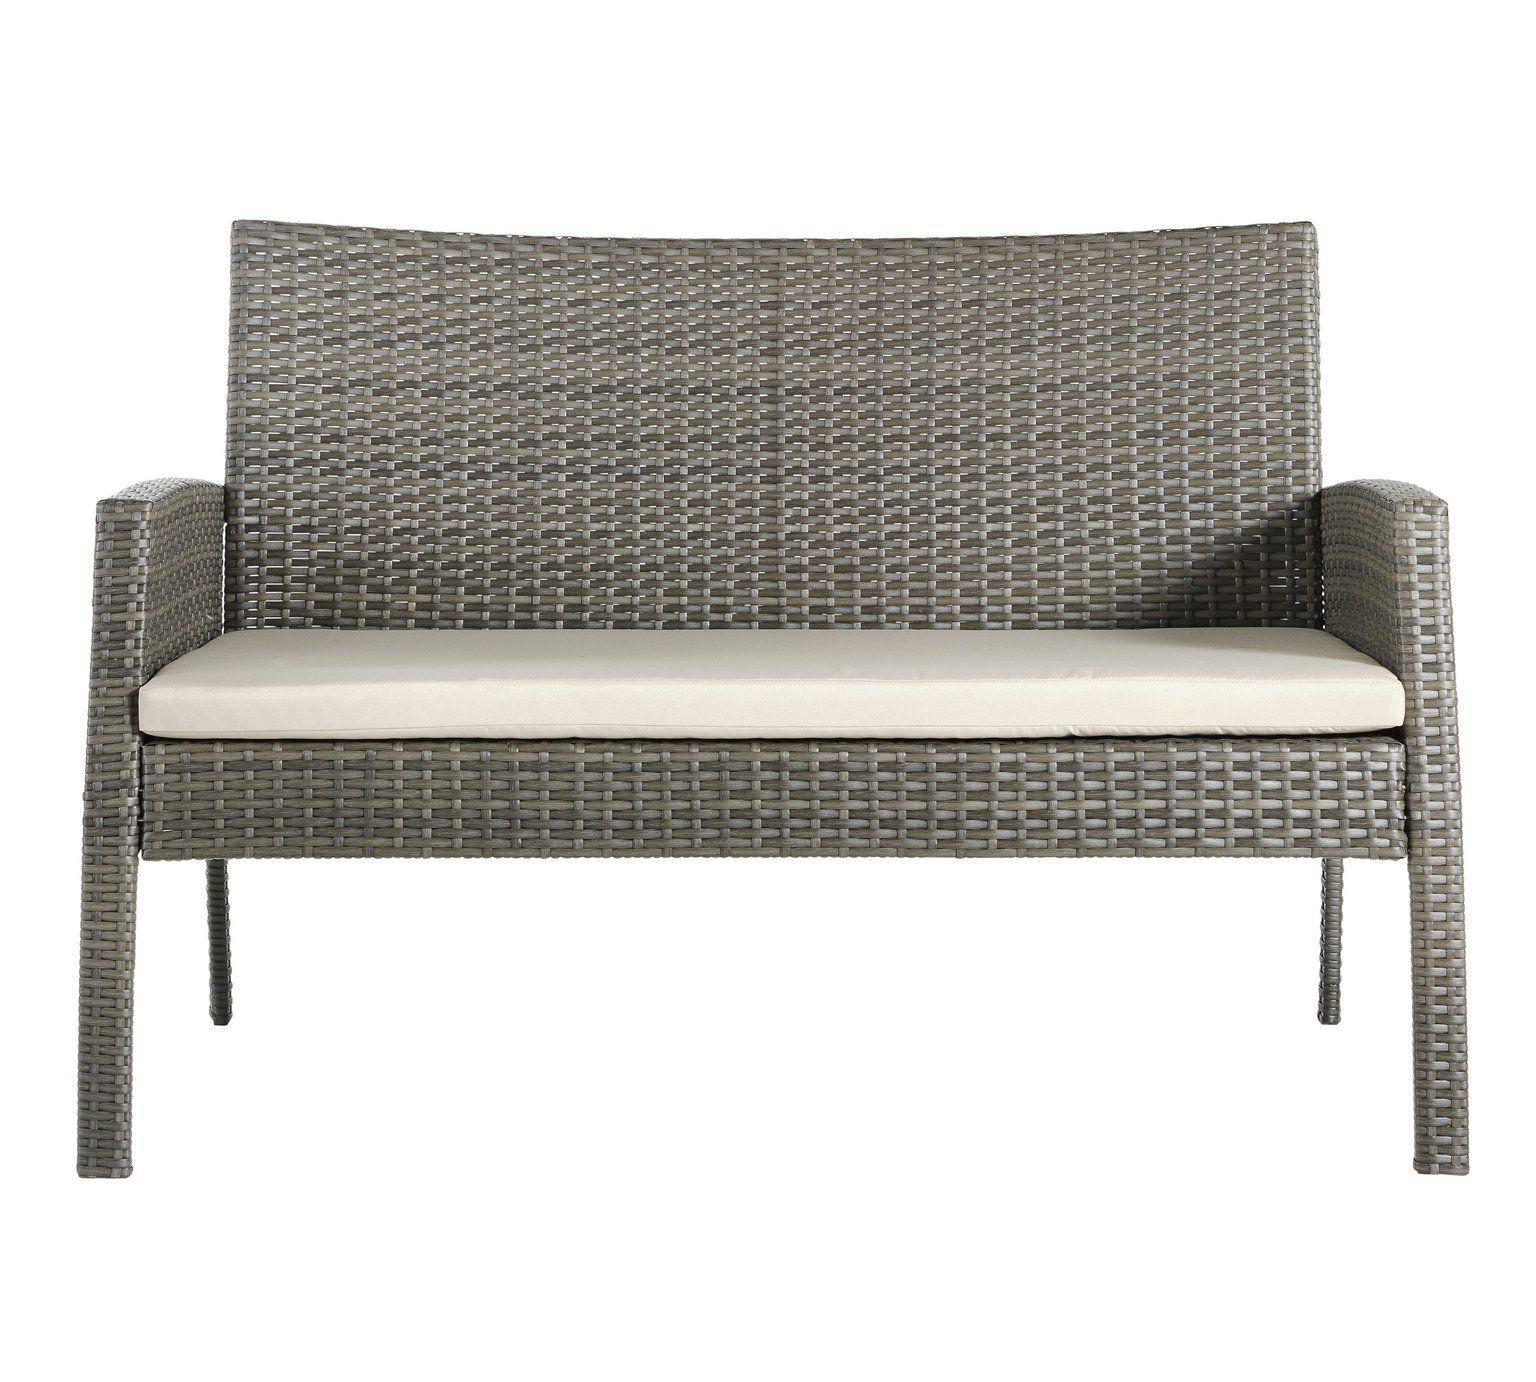 Buy Home Lucia 4 Seater Garden Sofa At Argos.co.uk, Visit Argos (Image 2 of 20)